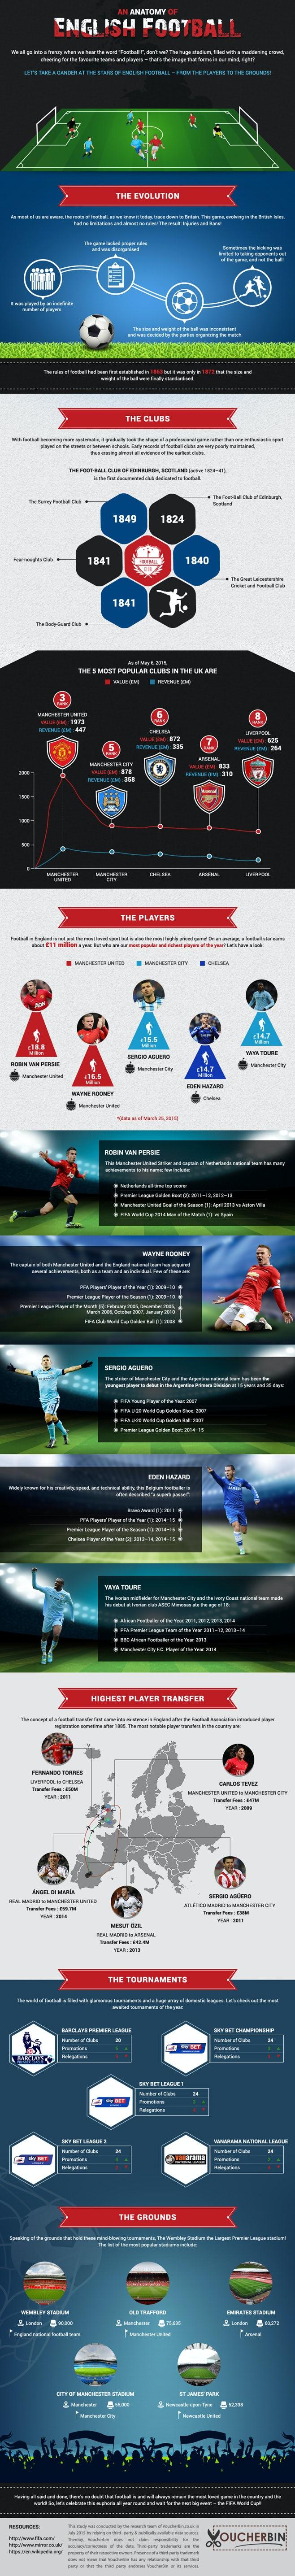 voucherbin-infographic-an-anatomy-of-english-football